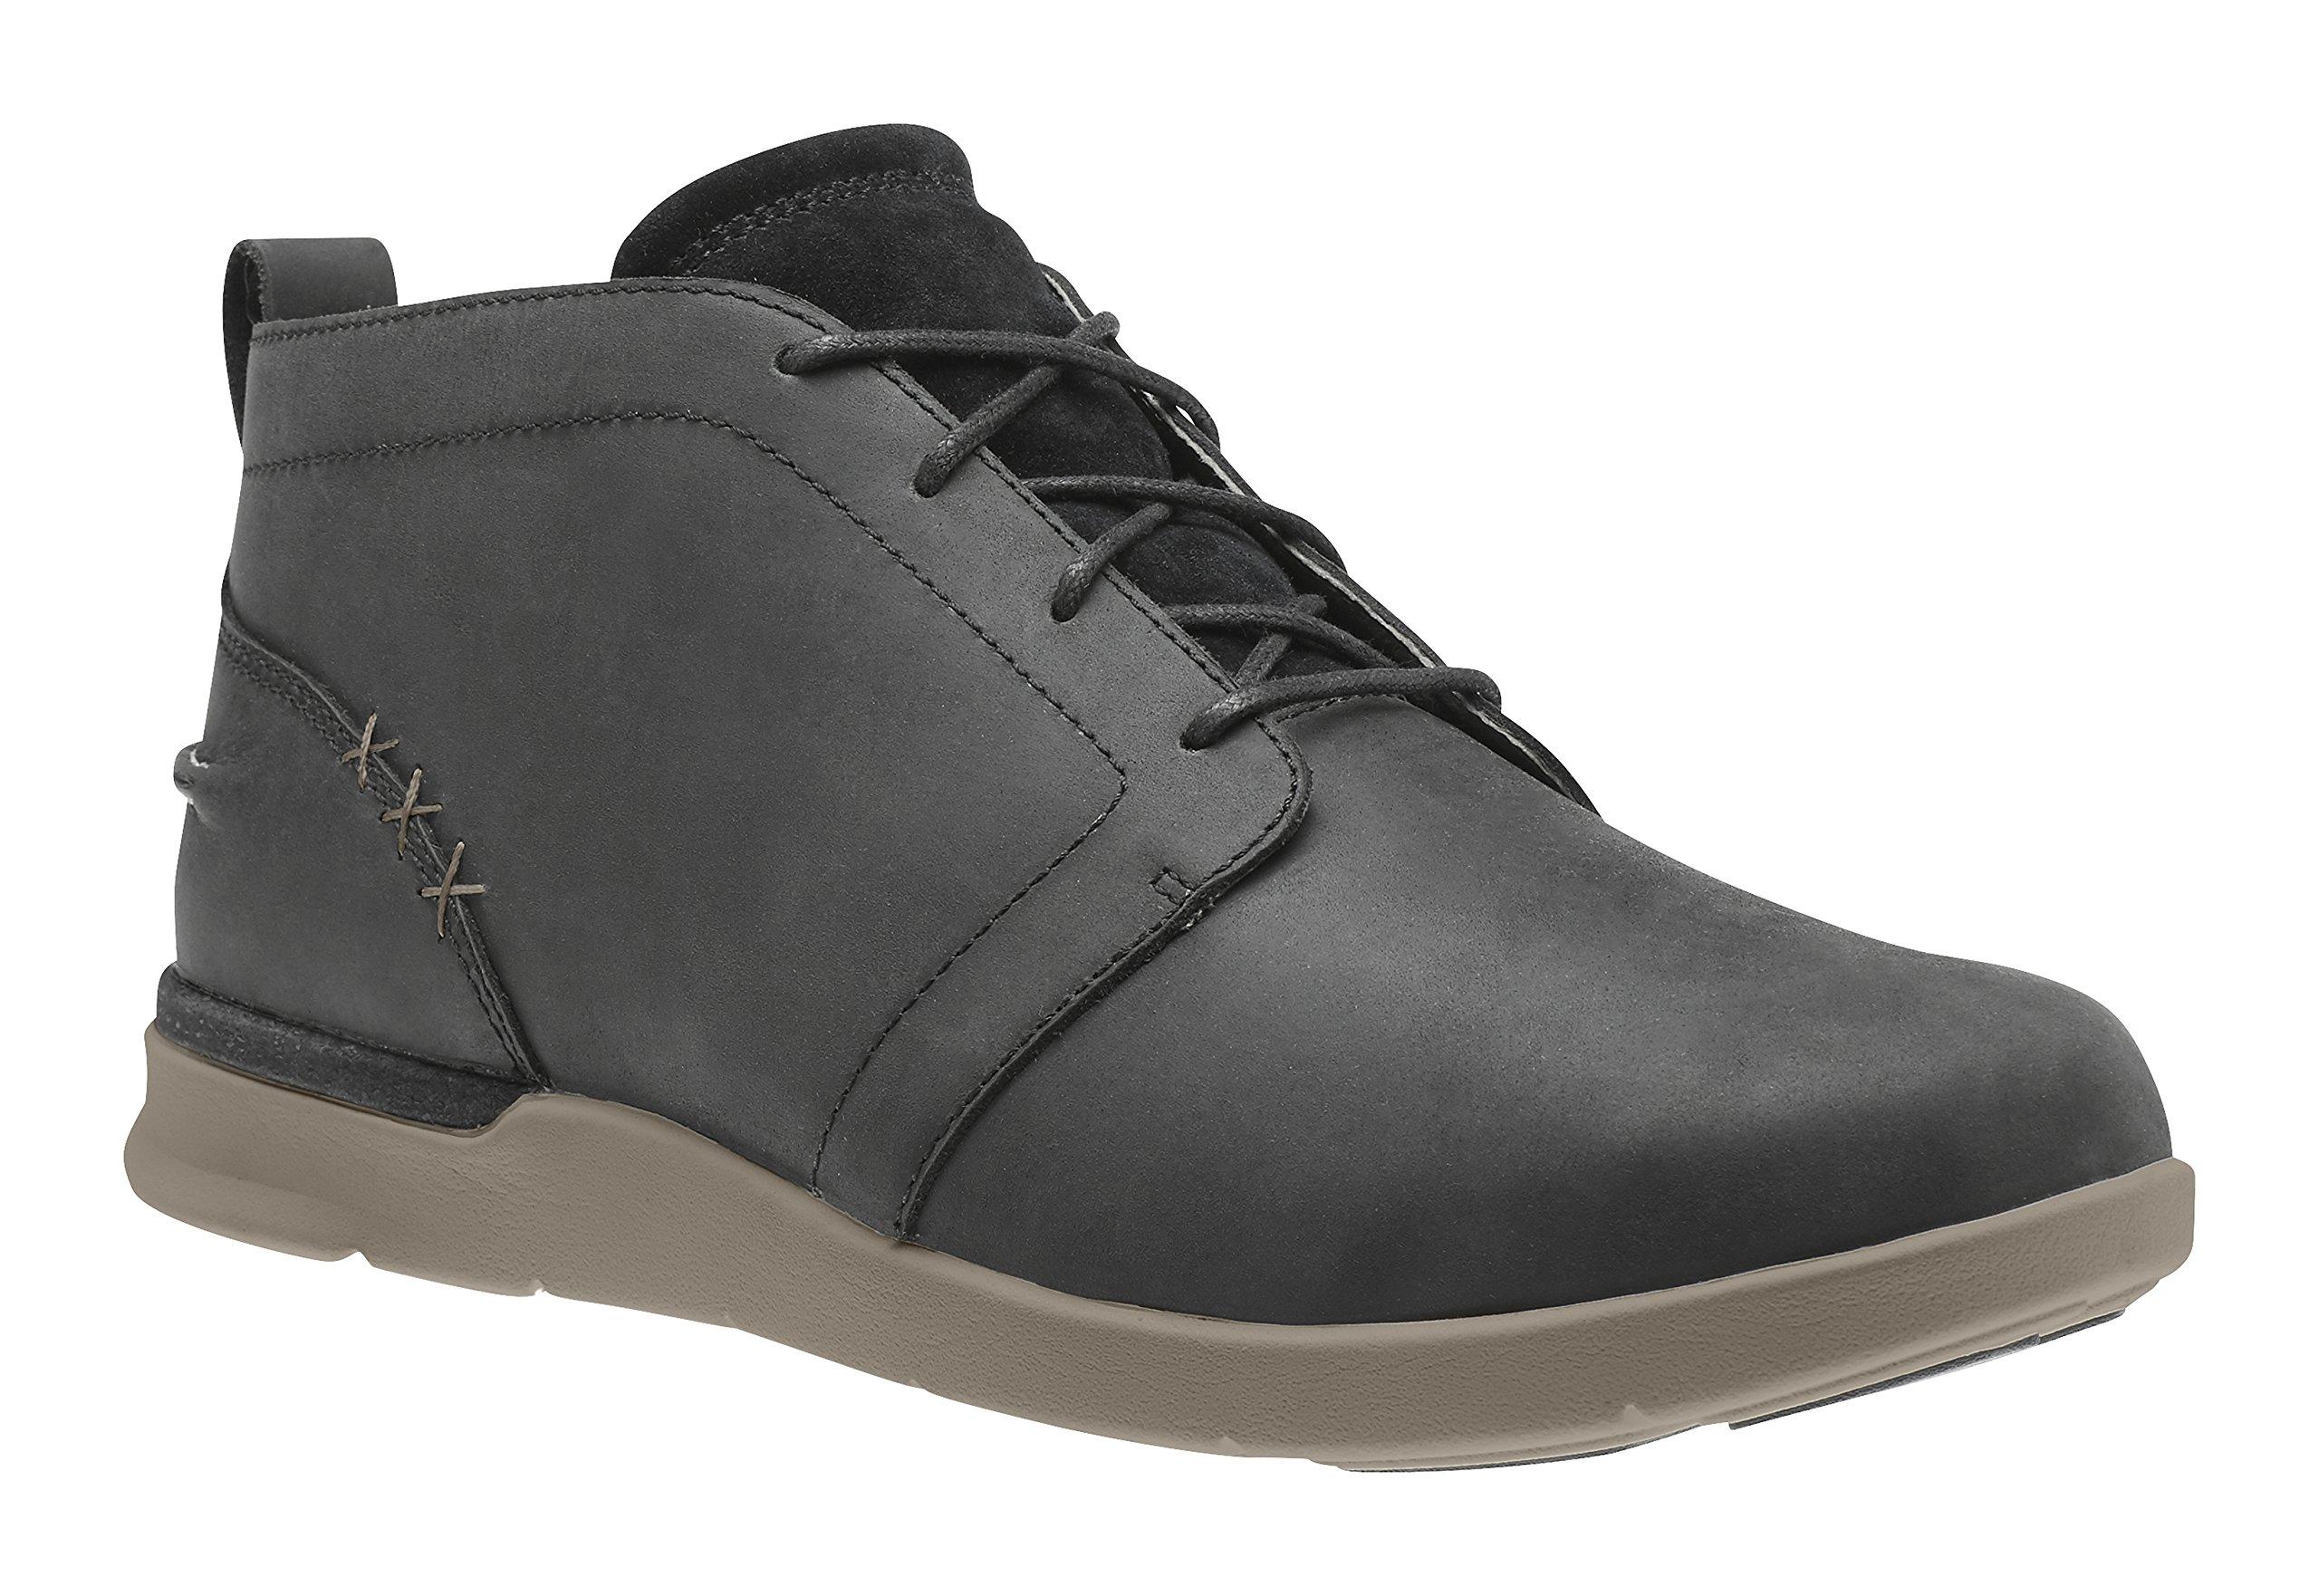 Superfeet Douglas Men's Comfort Casual Boot, Black/Brindle, Full Grain Leather, Men's 11.5 US